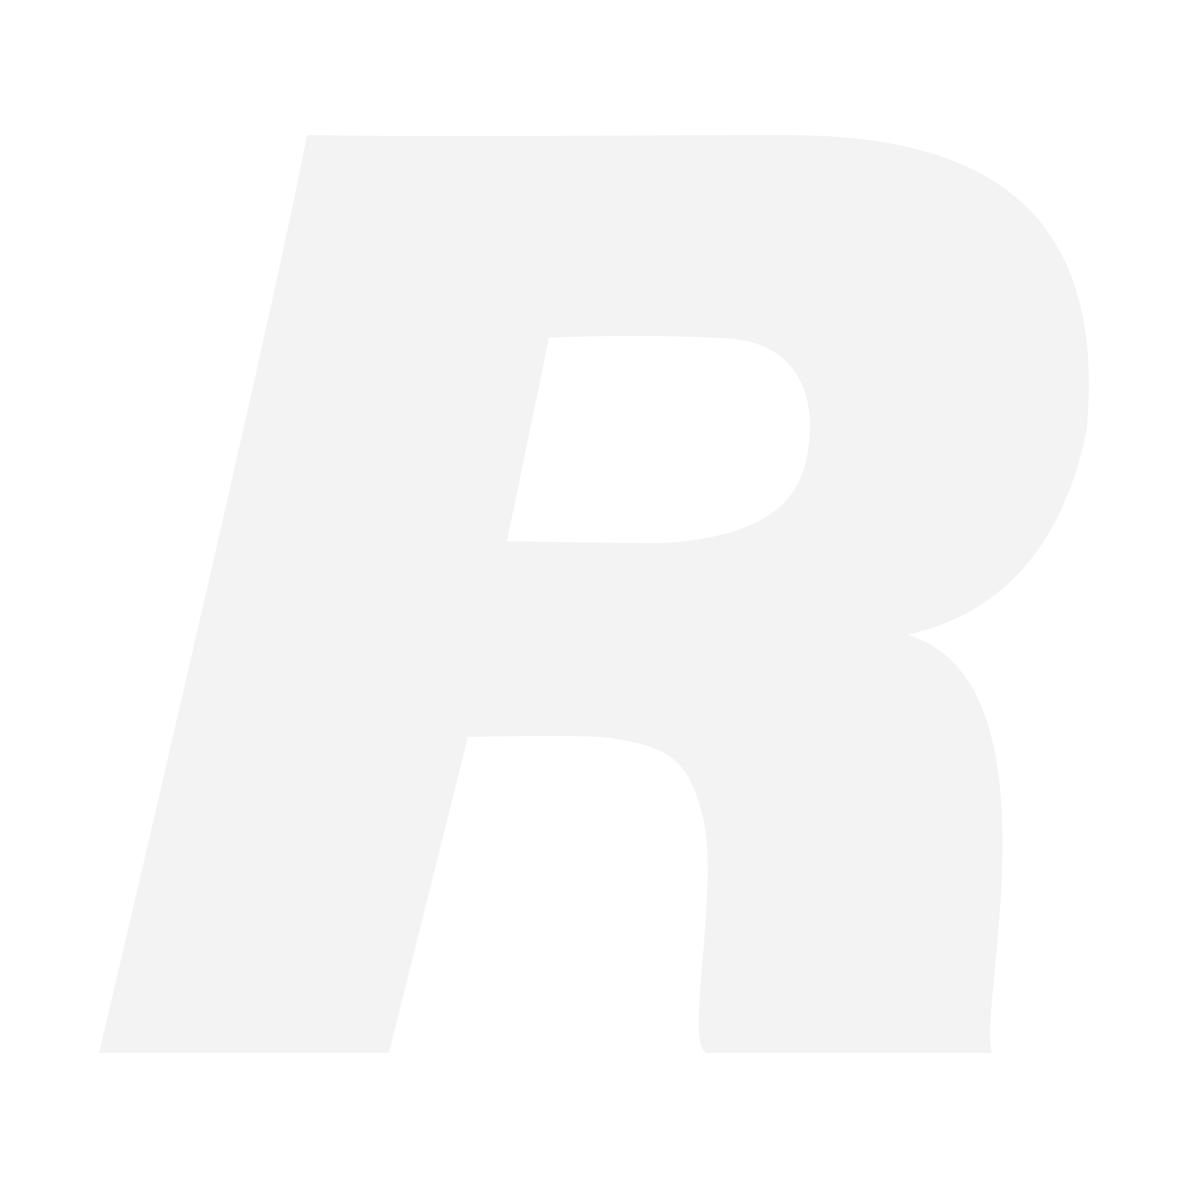 Swarovski AR-S Adapter Ring For ATX/STX